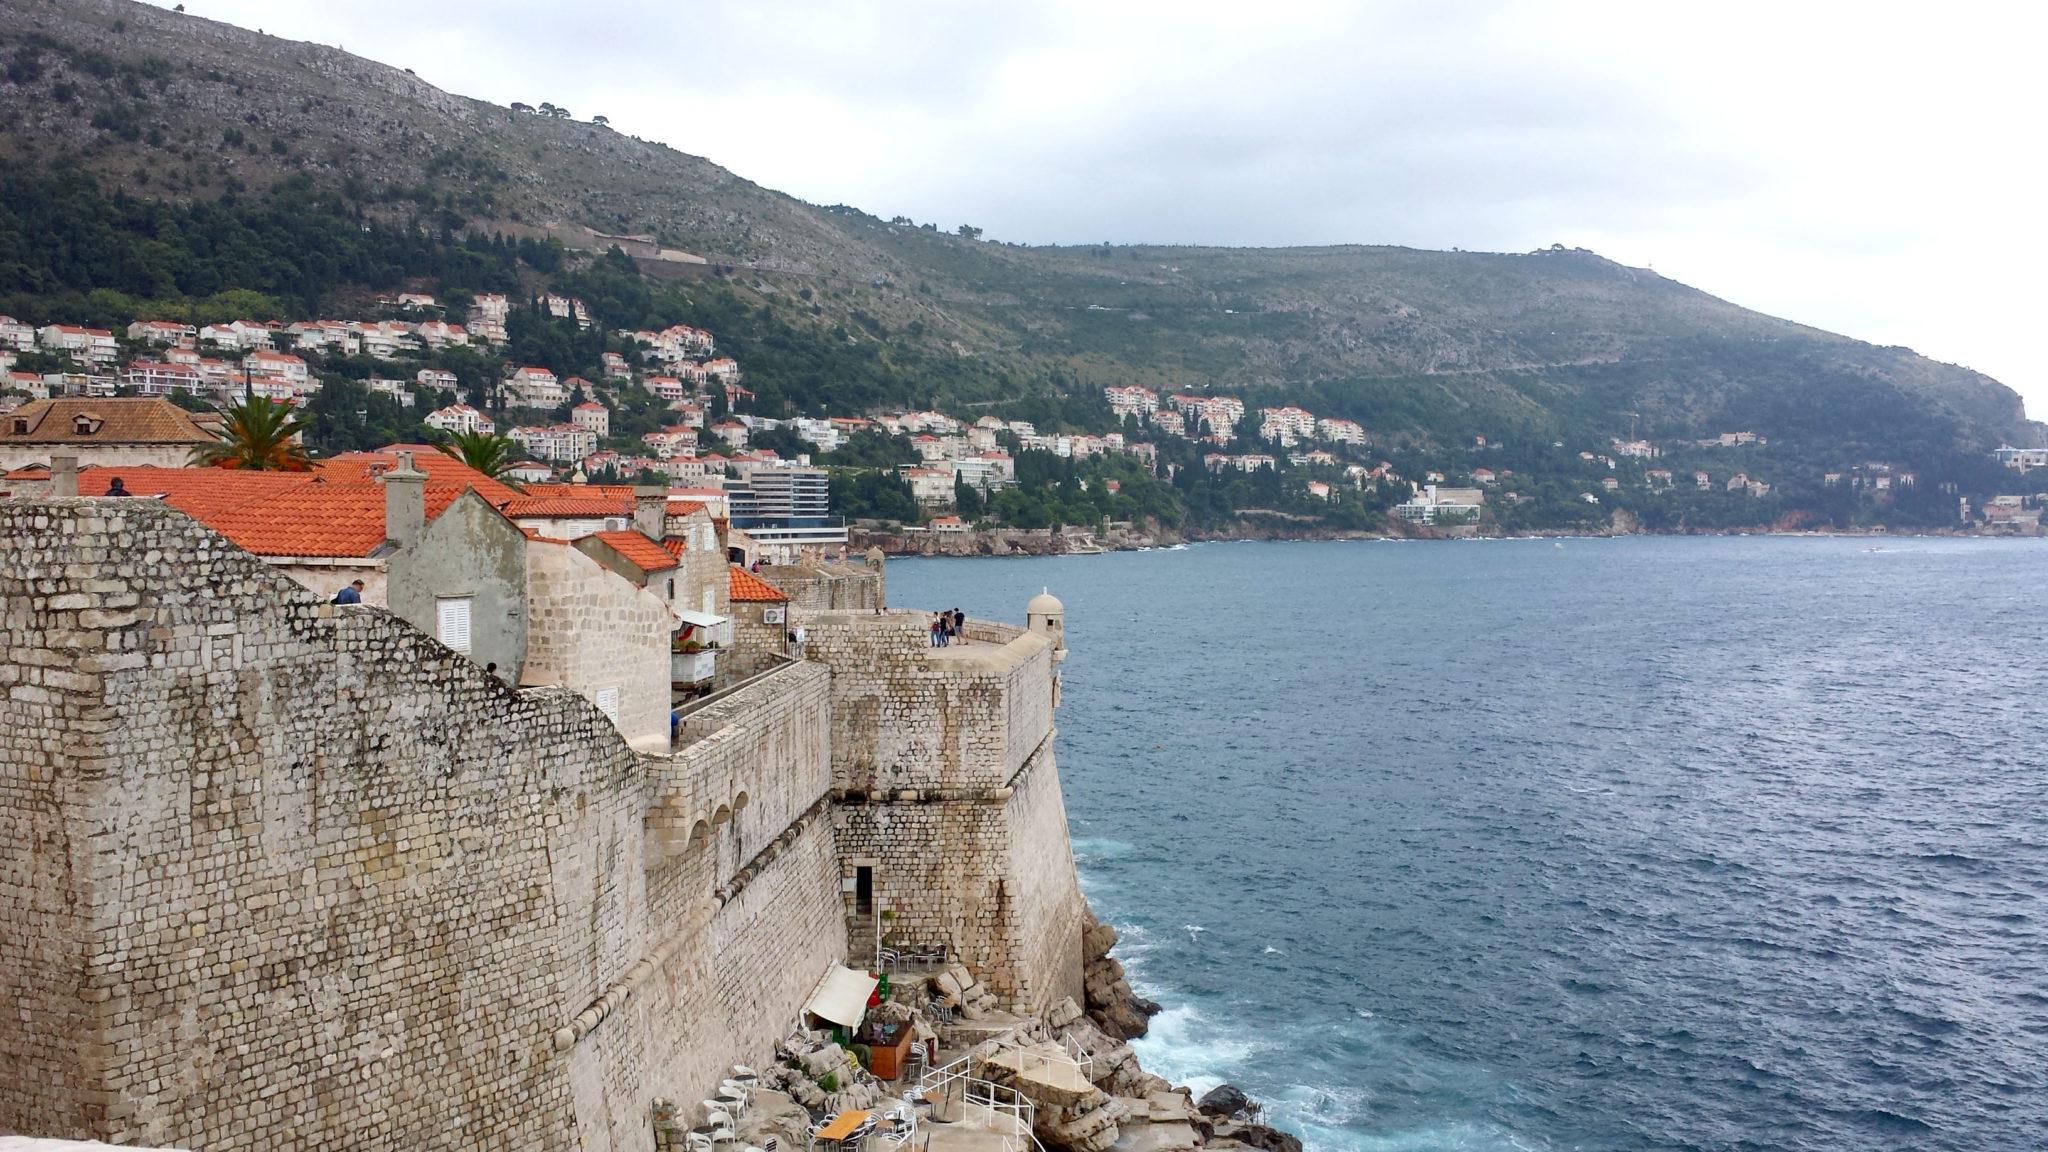 Hema_blog_mode_voyage_croatie_une_journee_a_dubrovnik_balade_sur_rempart_13